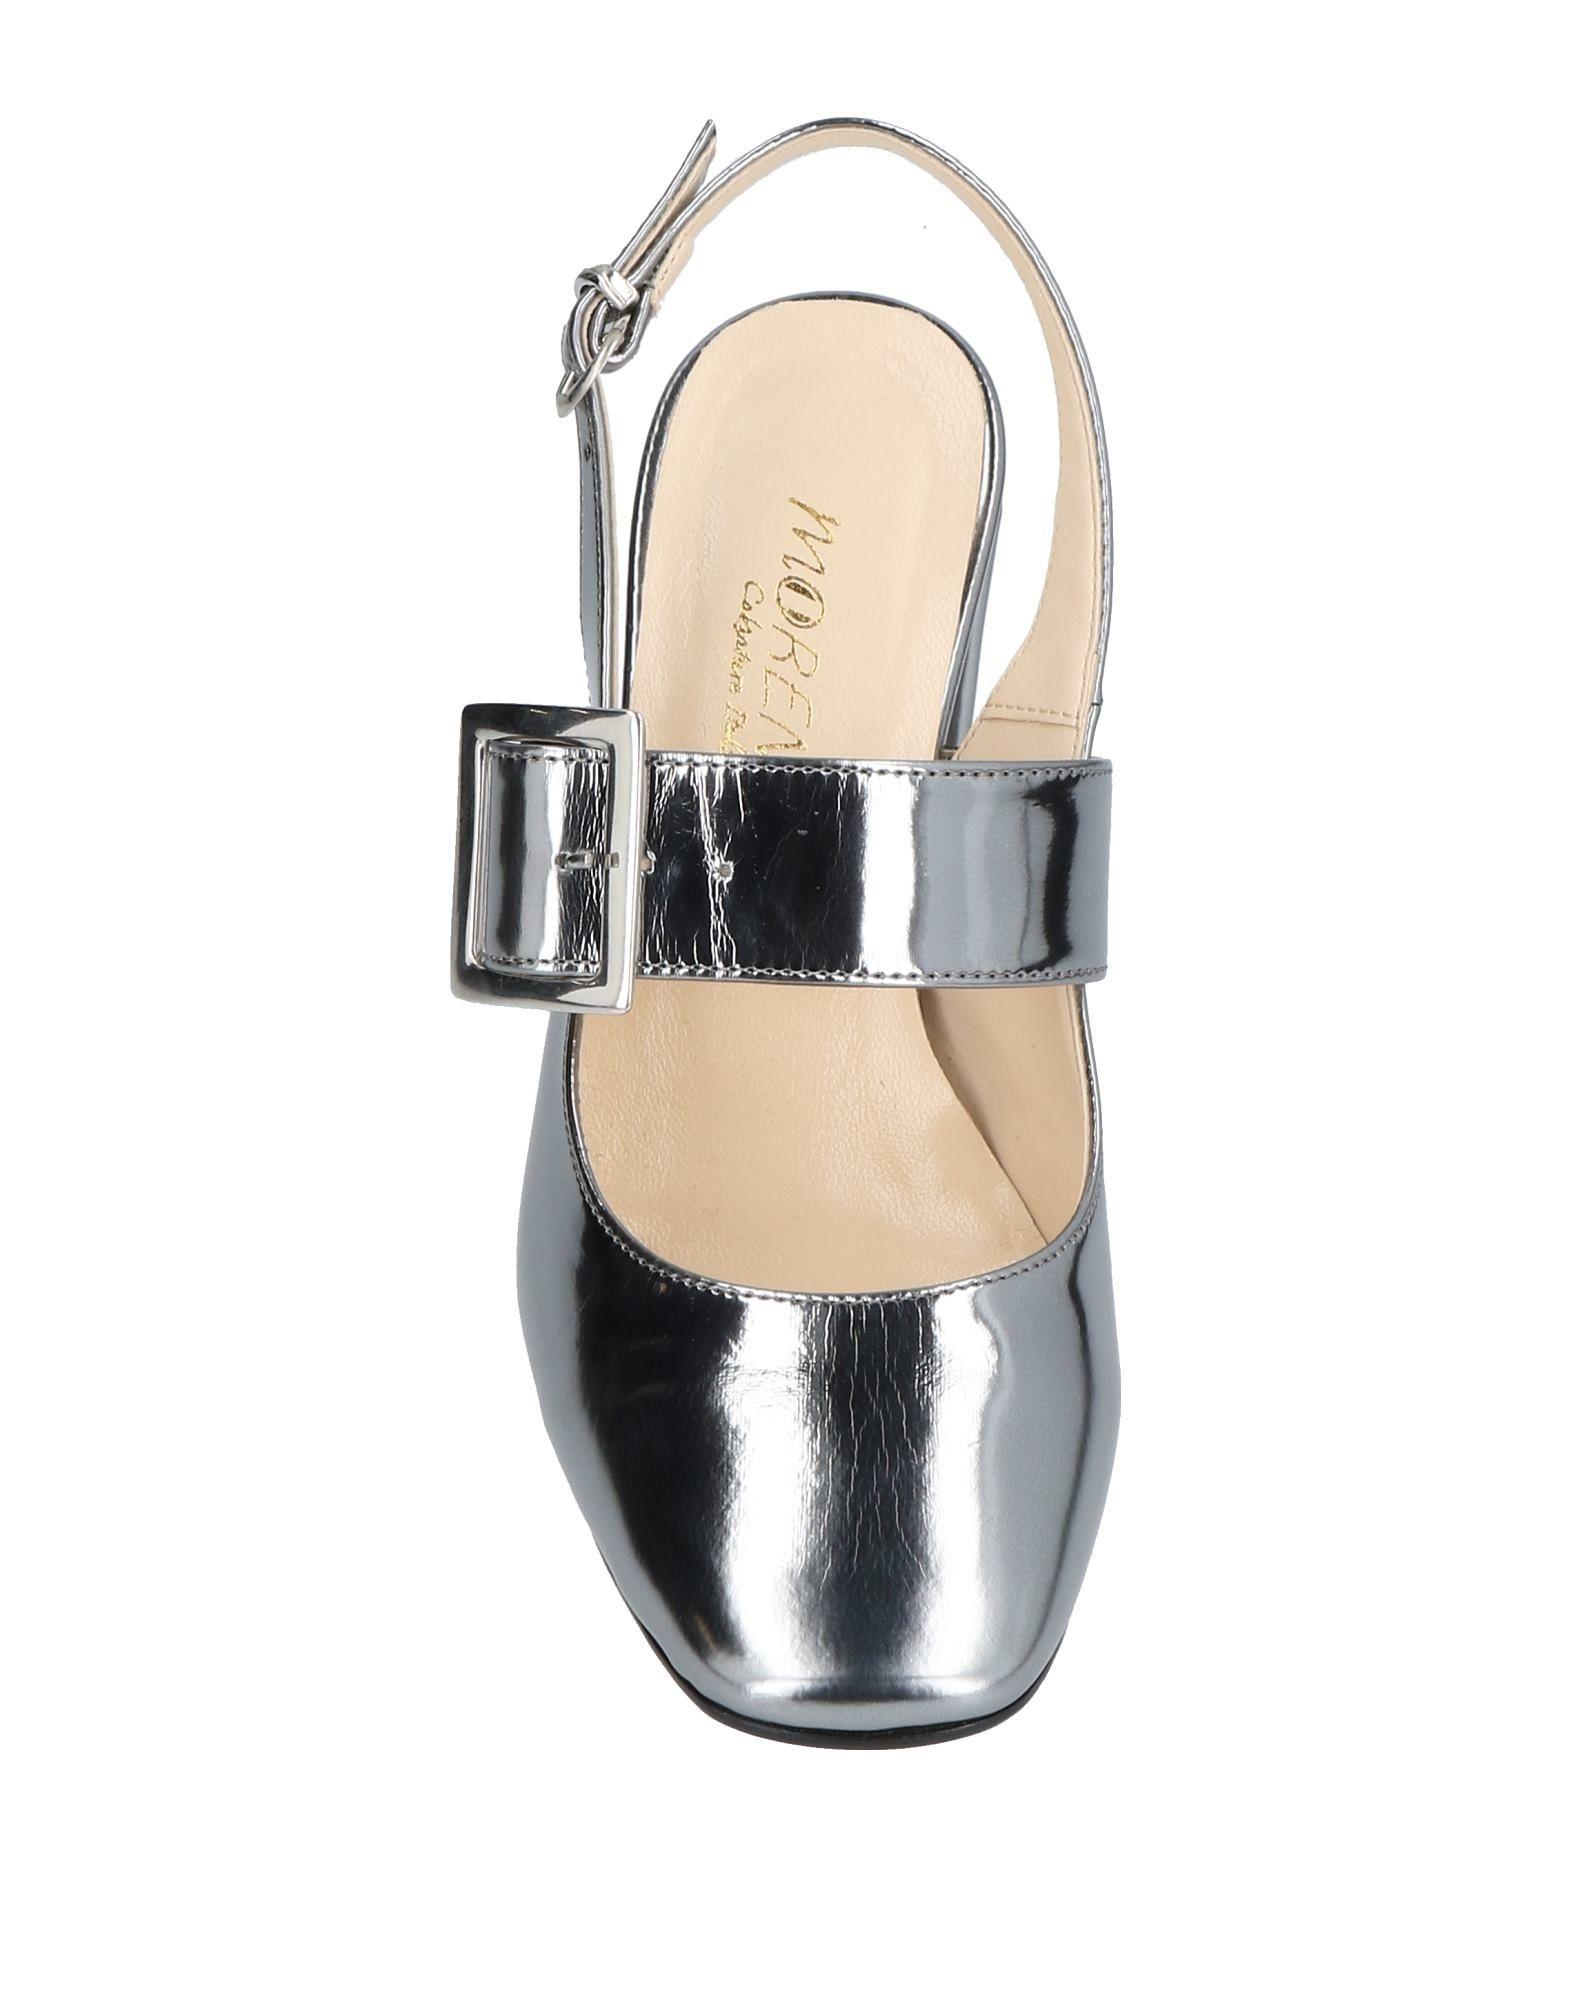 Morena  Calzature Italiane Pumps Damen  Morena 11462927NK Gute Qualität beliebte Schuhe 268d8e